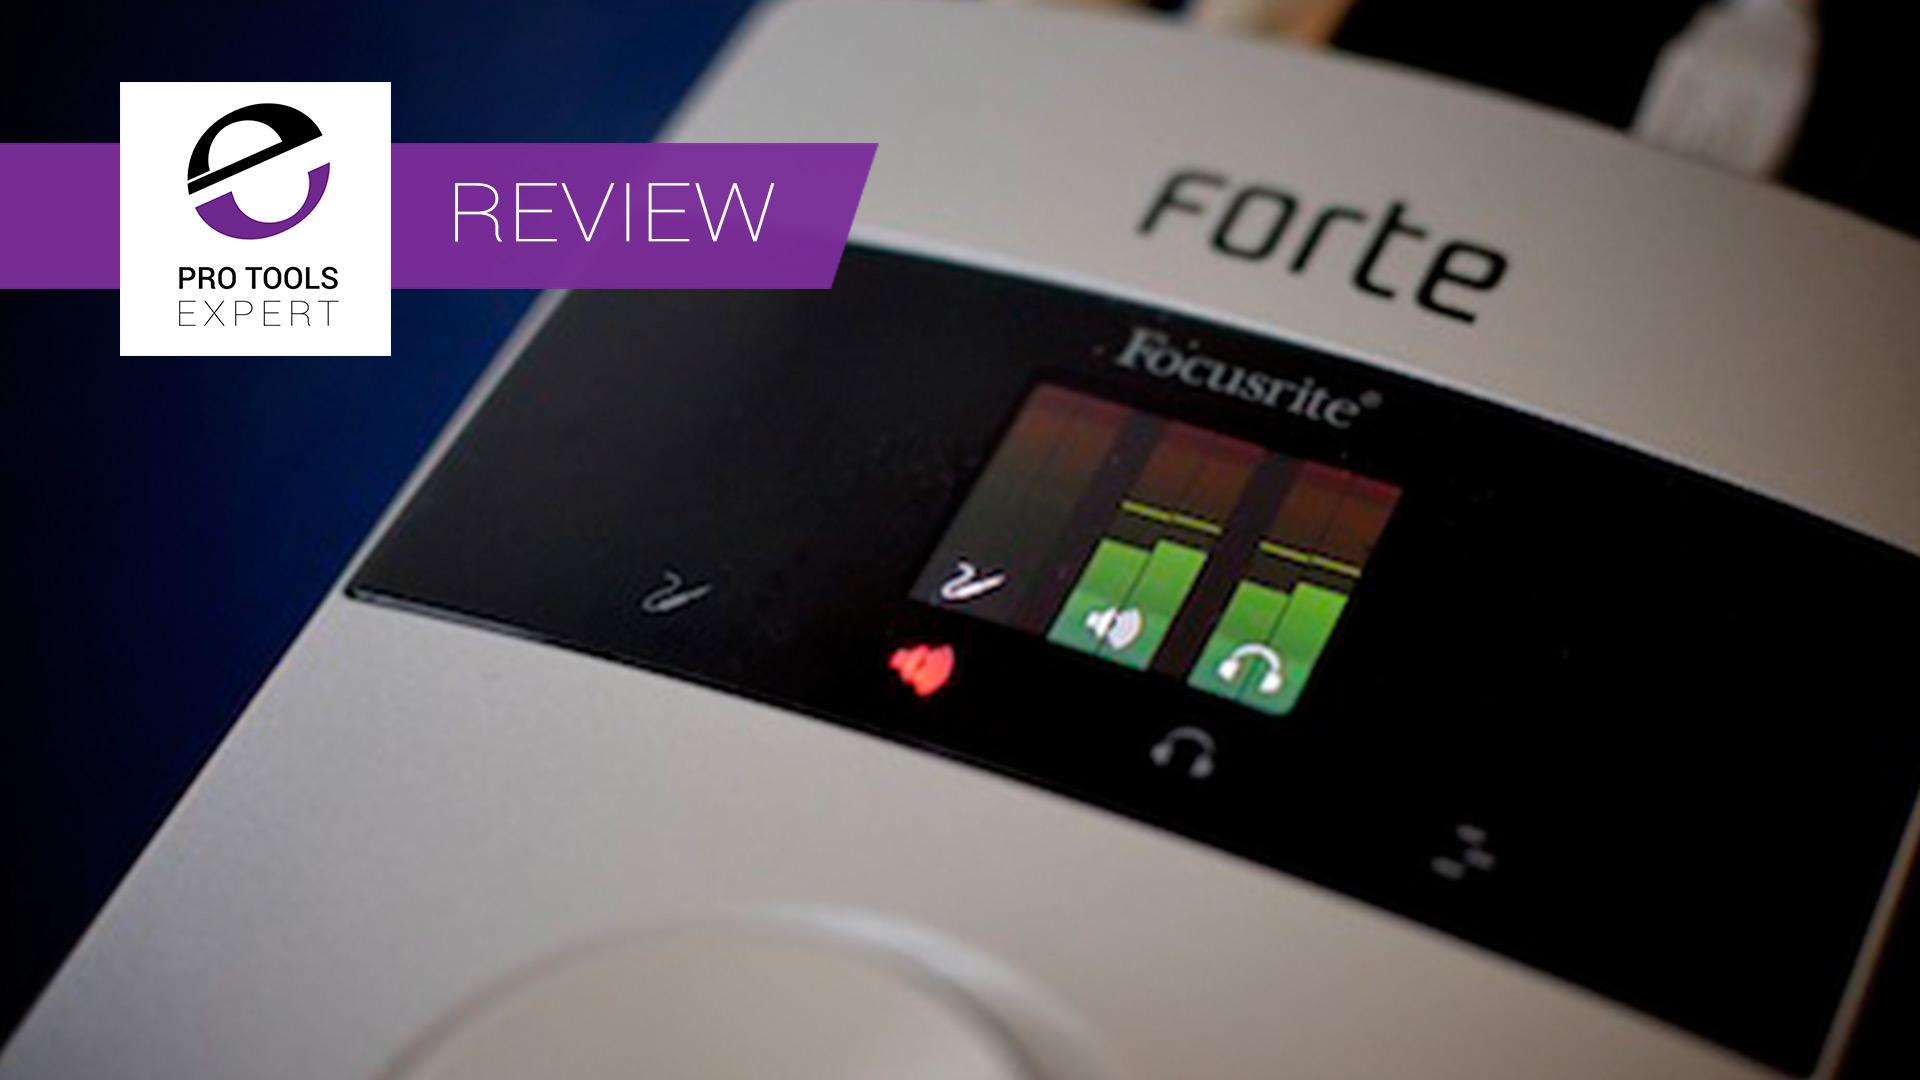 focusrite-forte-review-pro-tools-expert.jpg